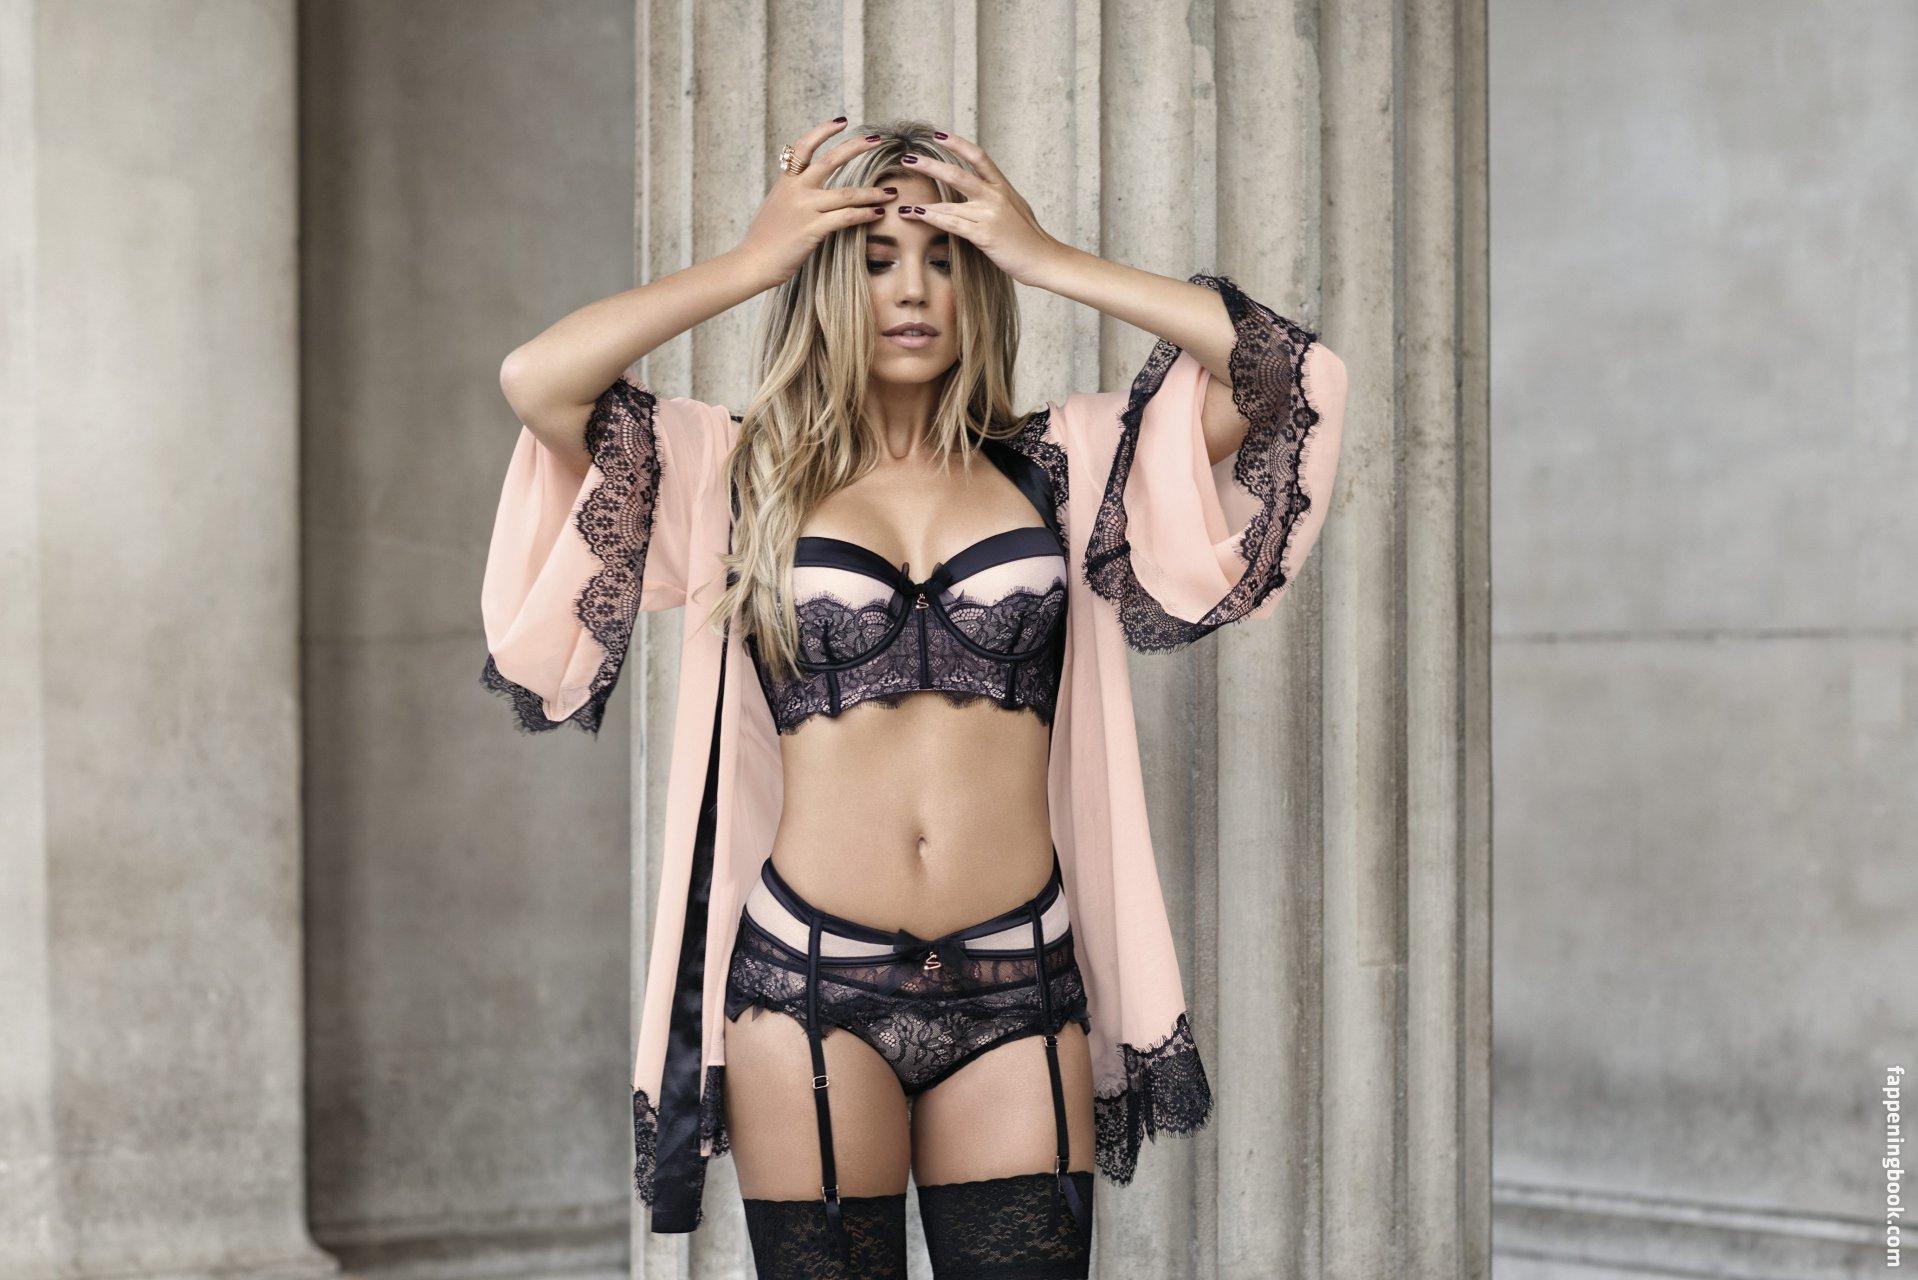 Micaela Schäfer Topless & Sexy (10 New Photos) | #TheFappening